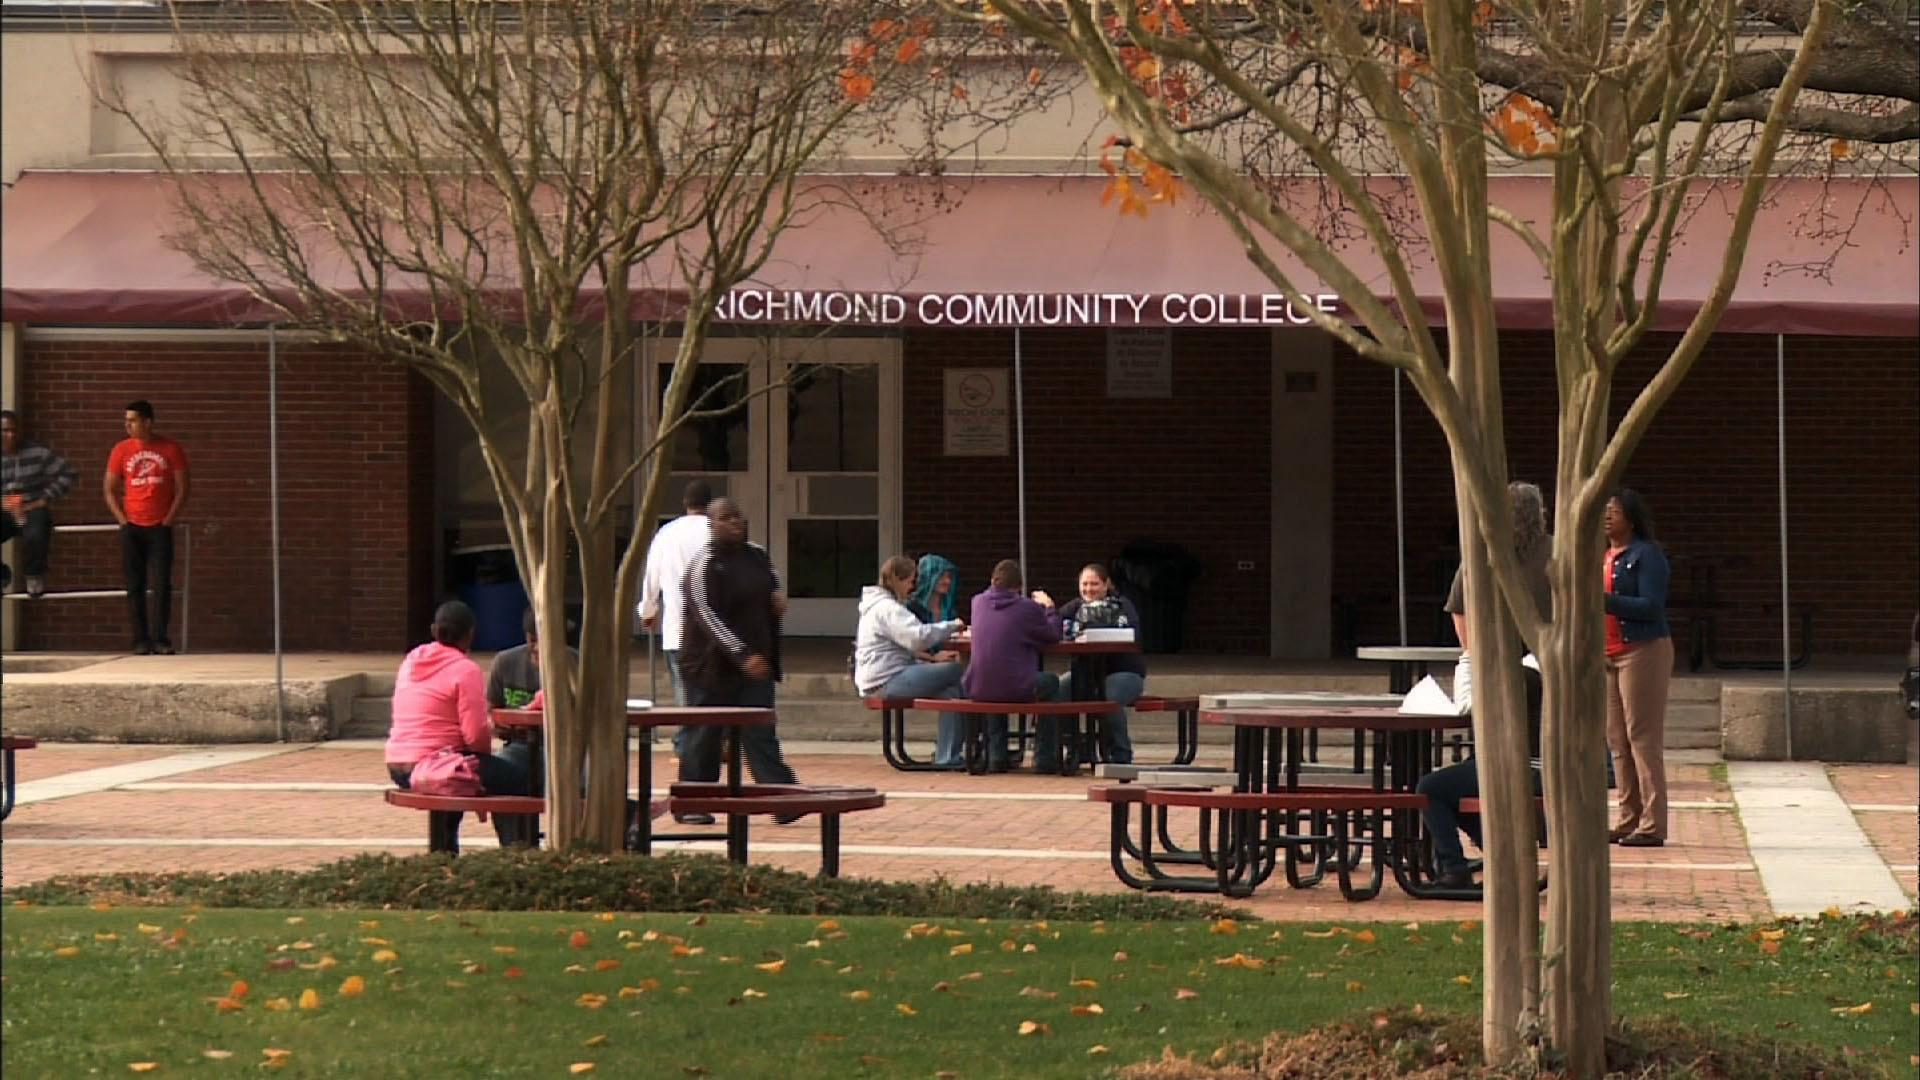 Richmond Community College image